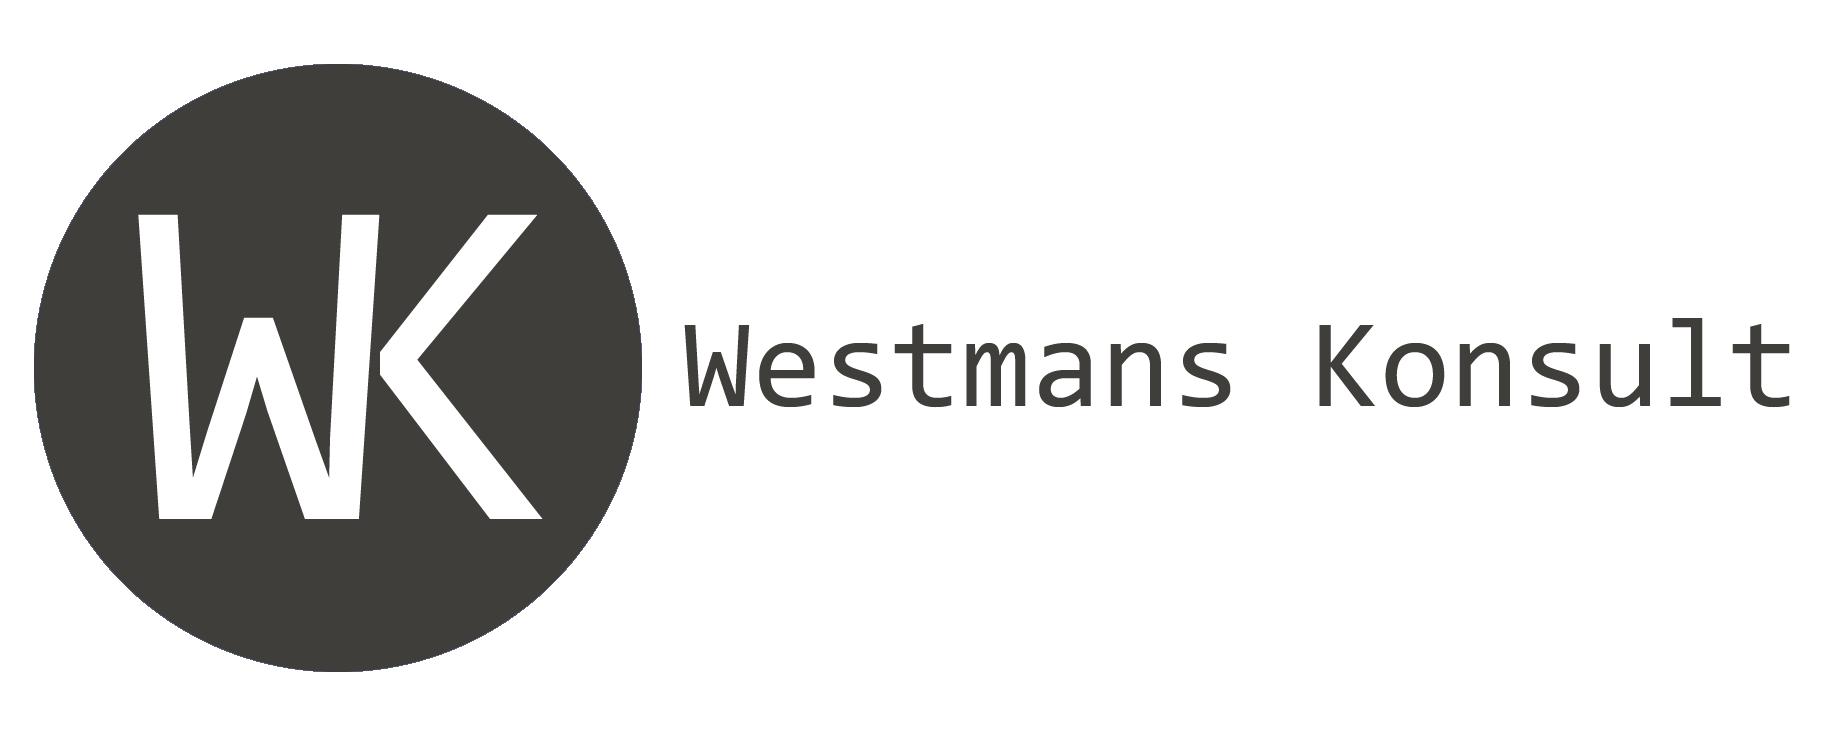 Westmanskonsult